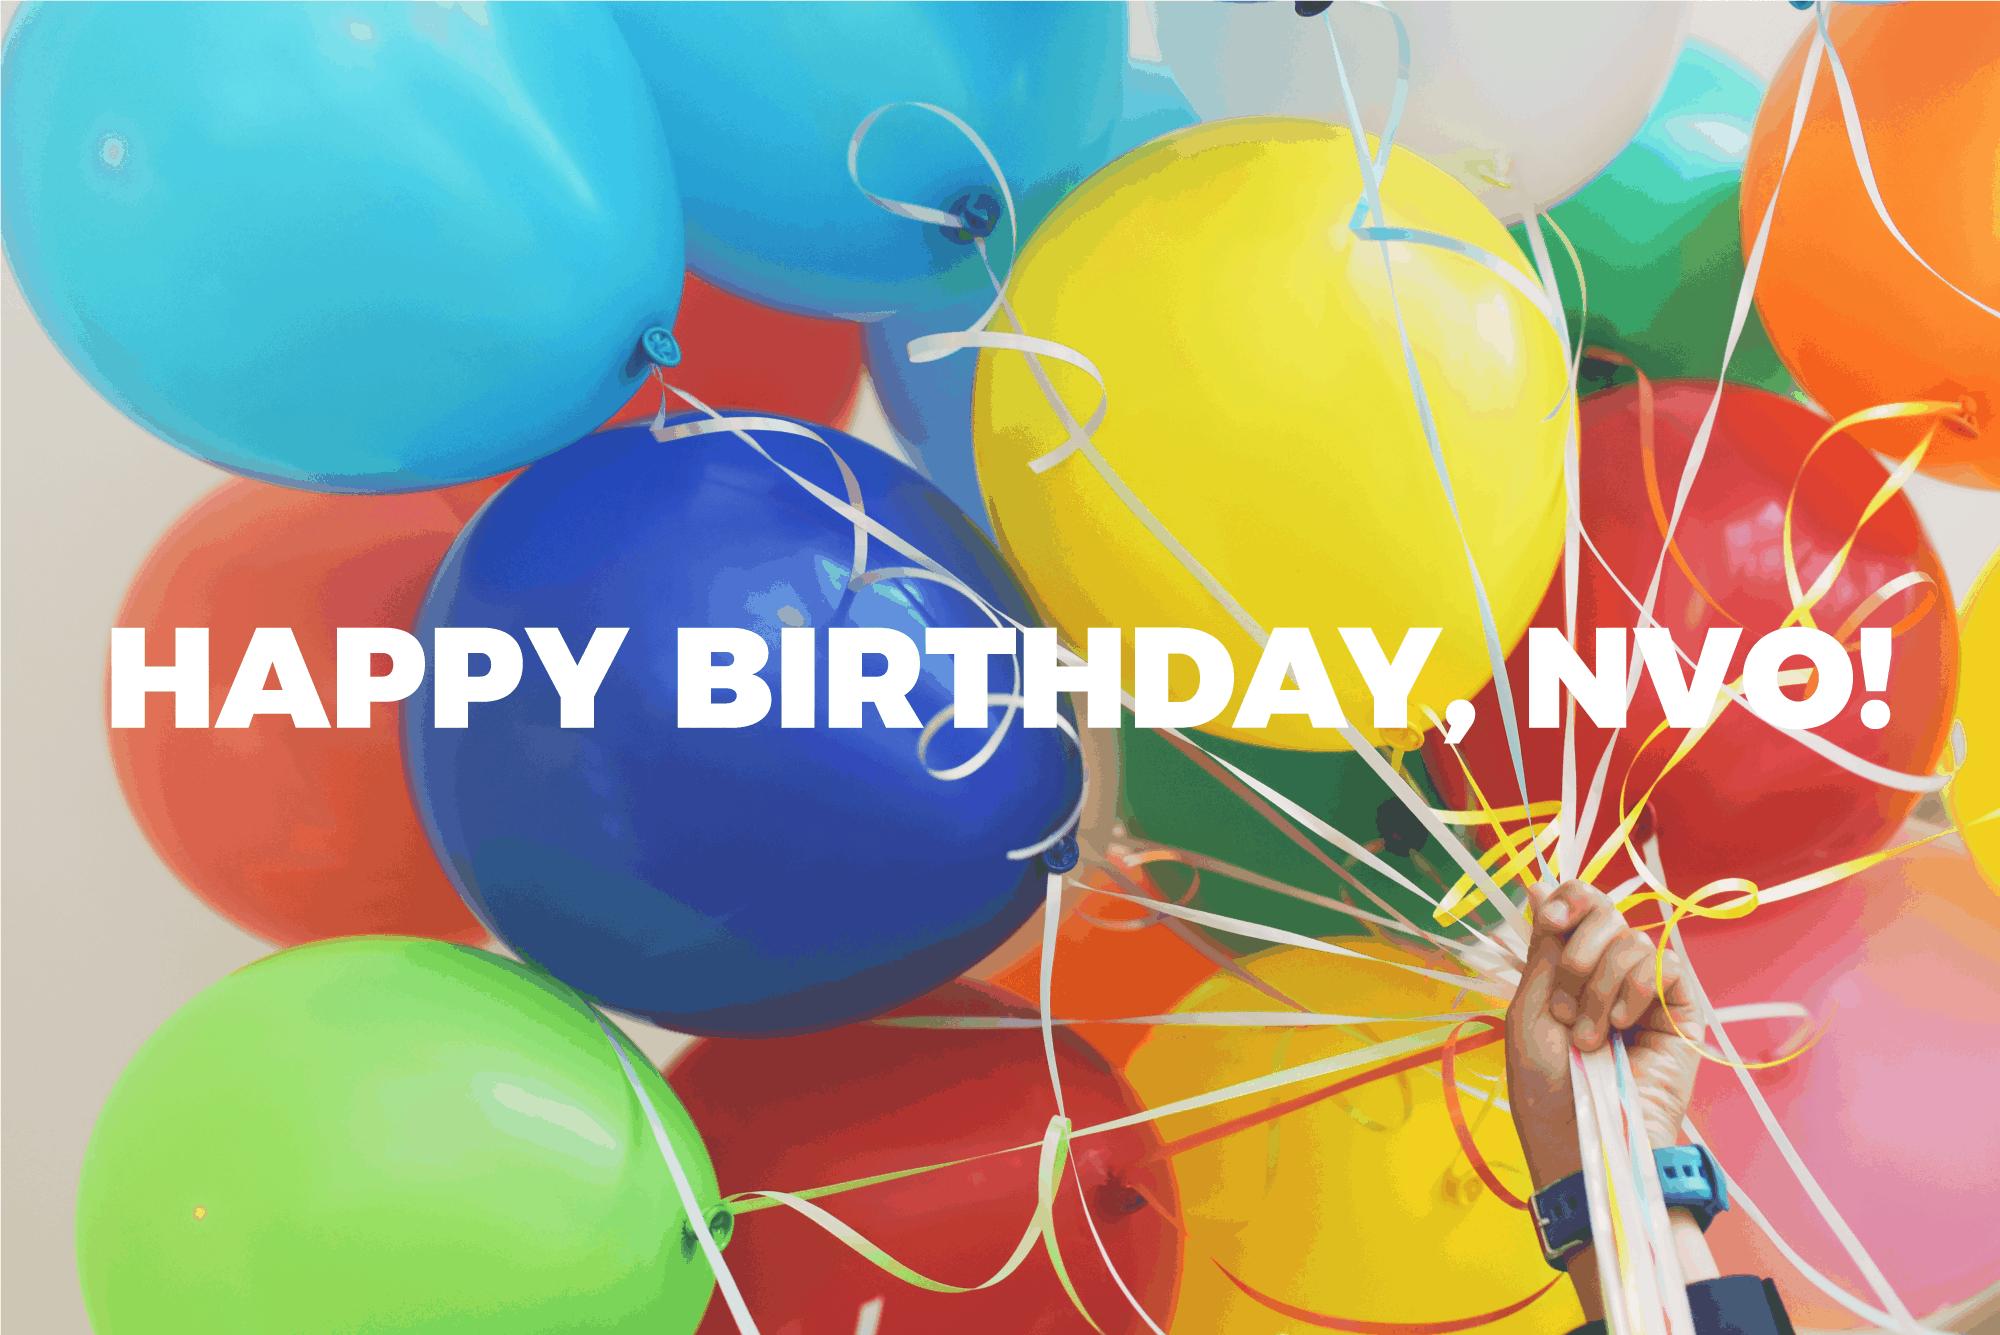 NVO is turning 10